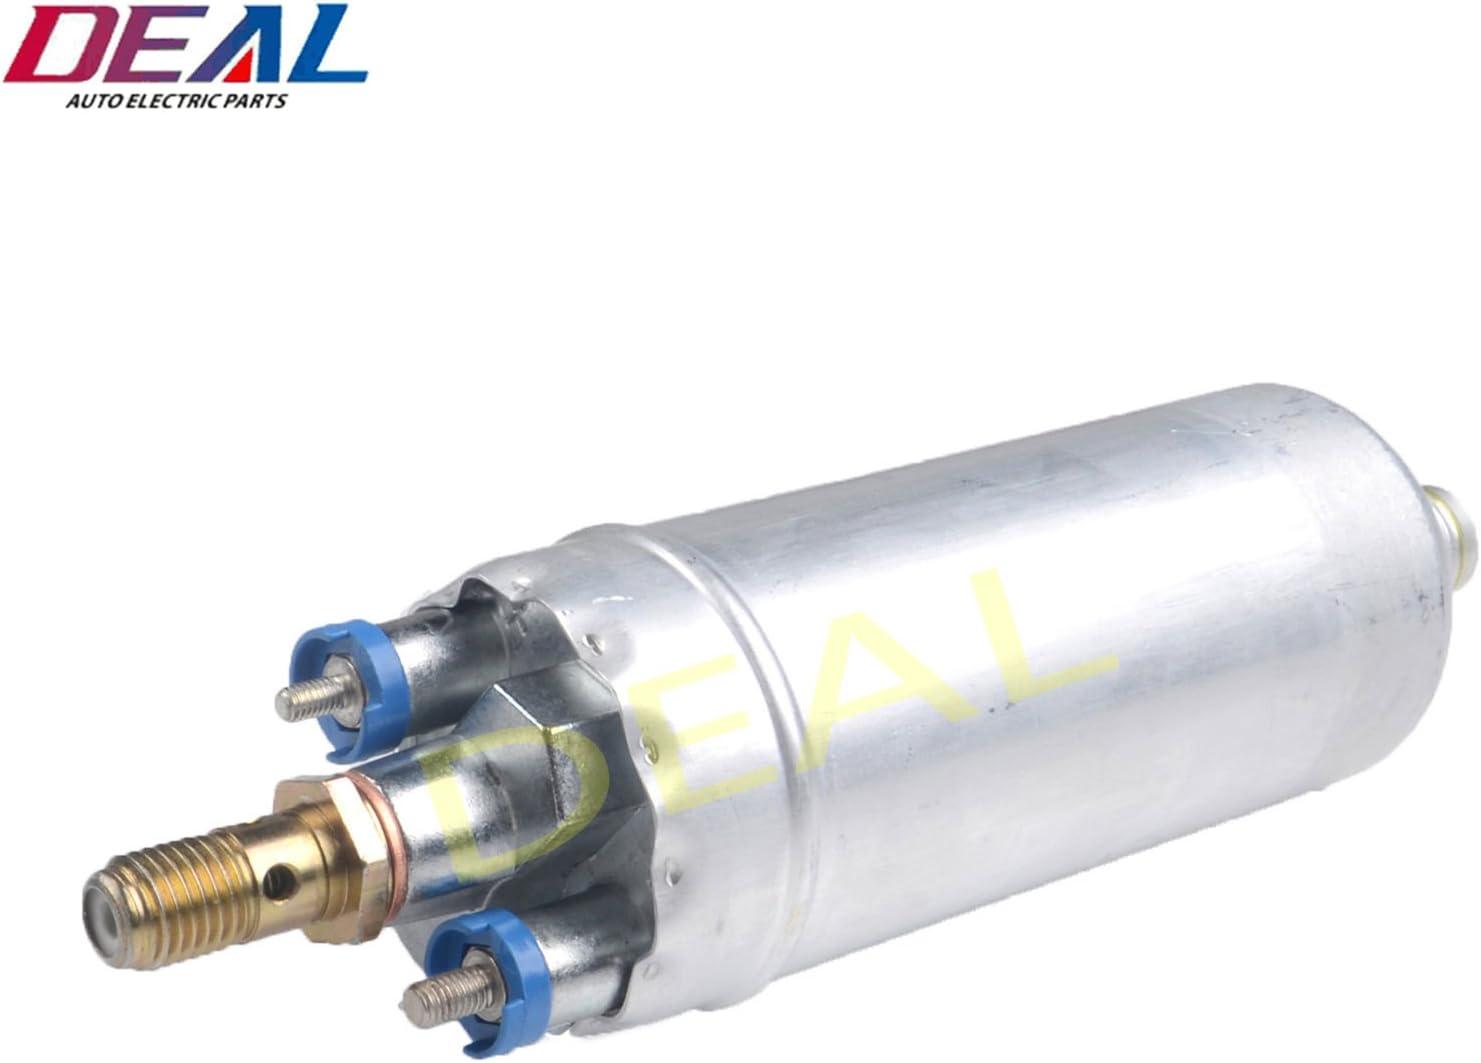 DEAL Set of 2 New EFI Electric External In-Line Fuel Pump Fit Benz C//CL//E//S//SL Class E8177